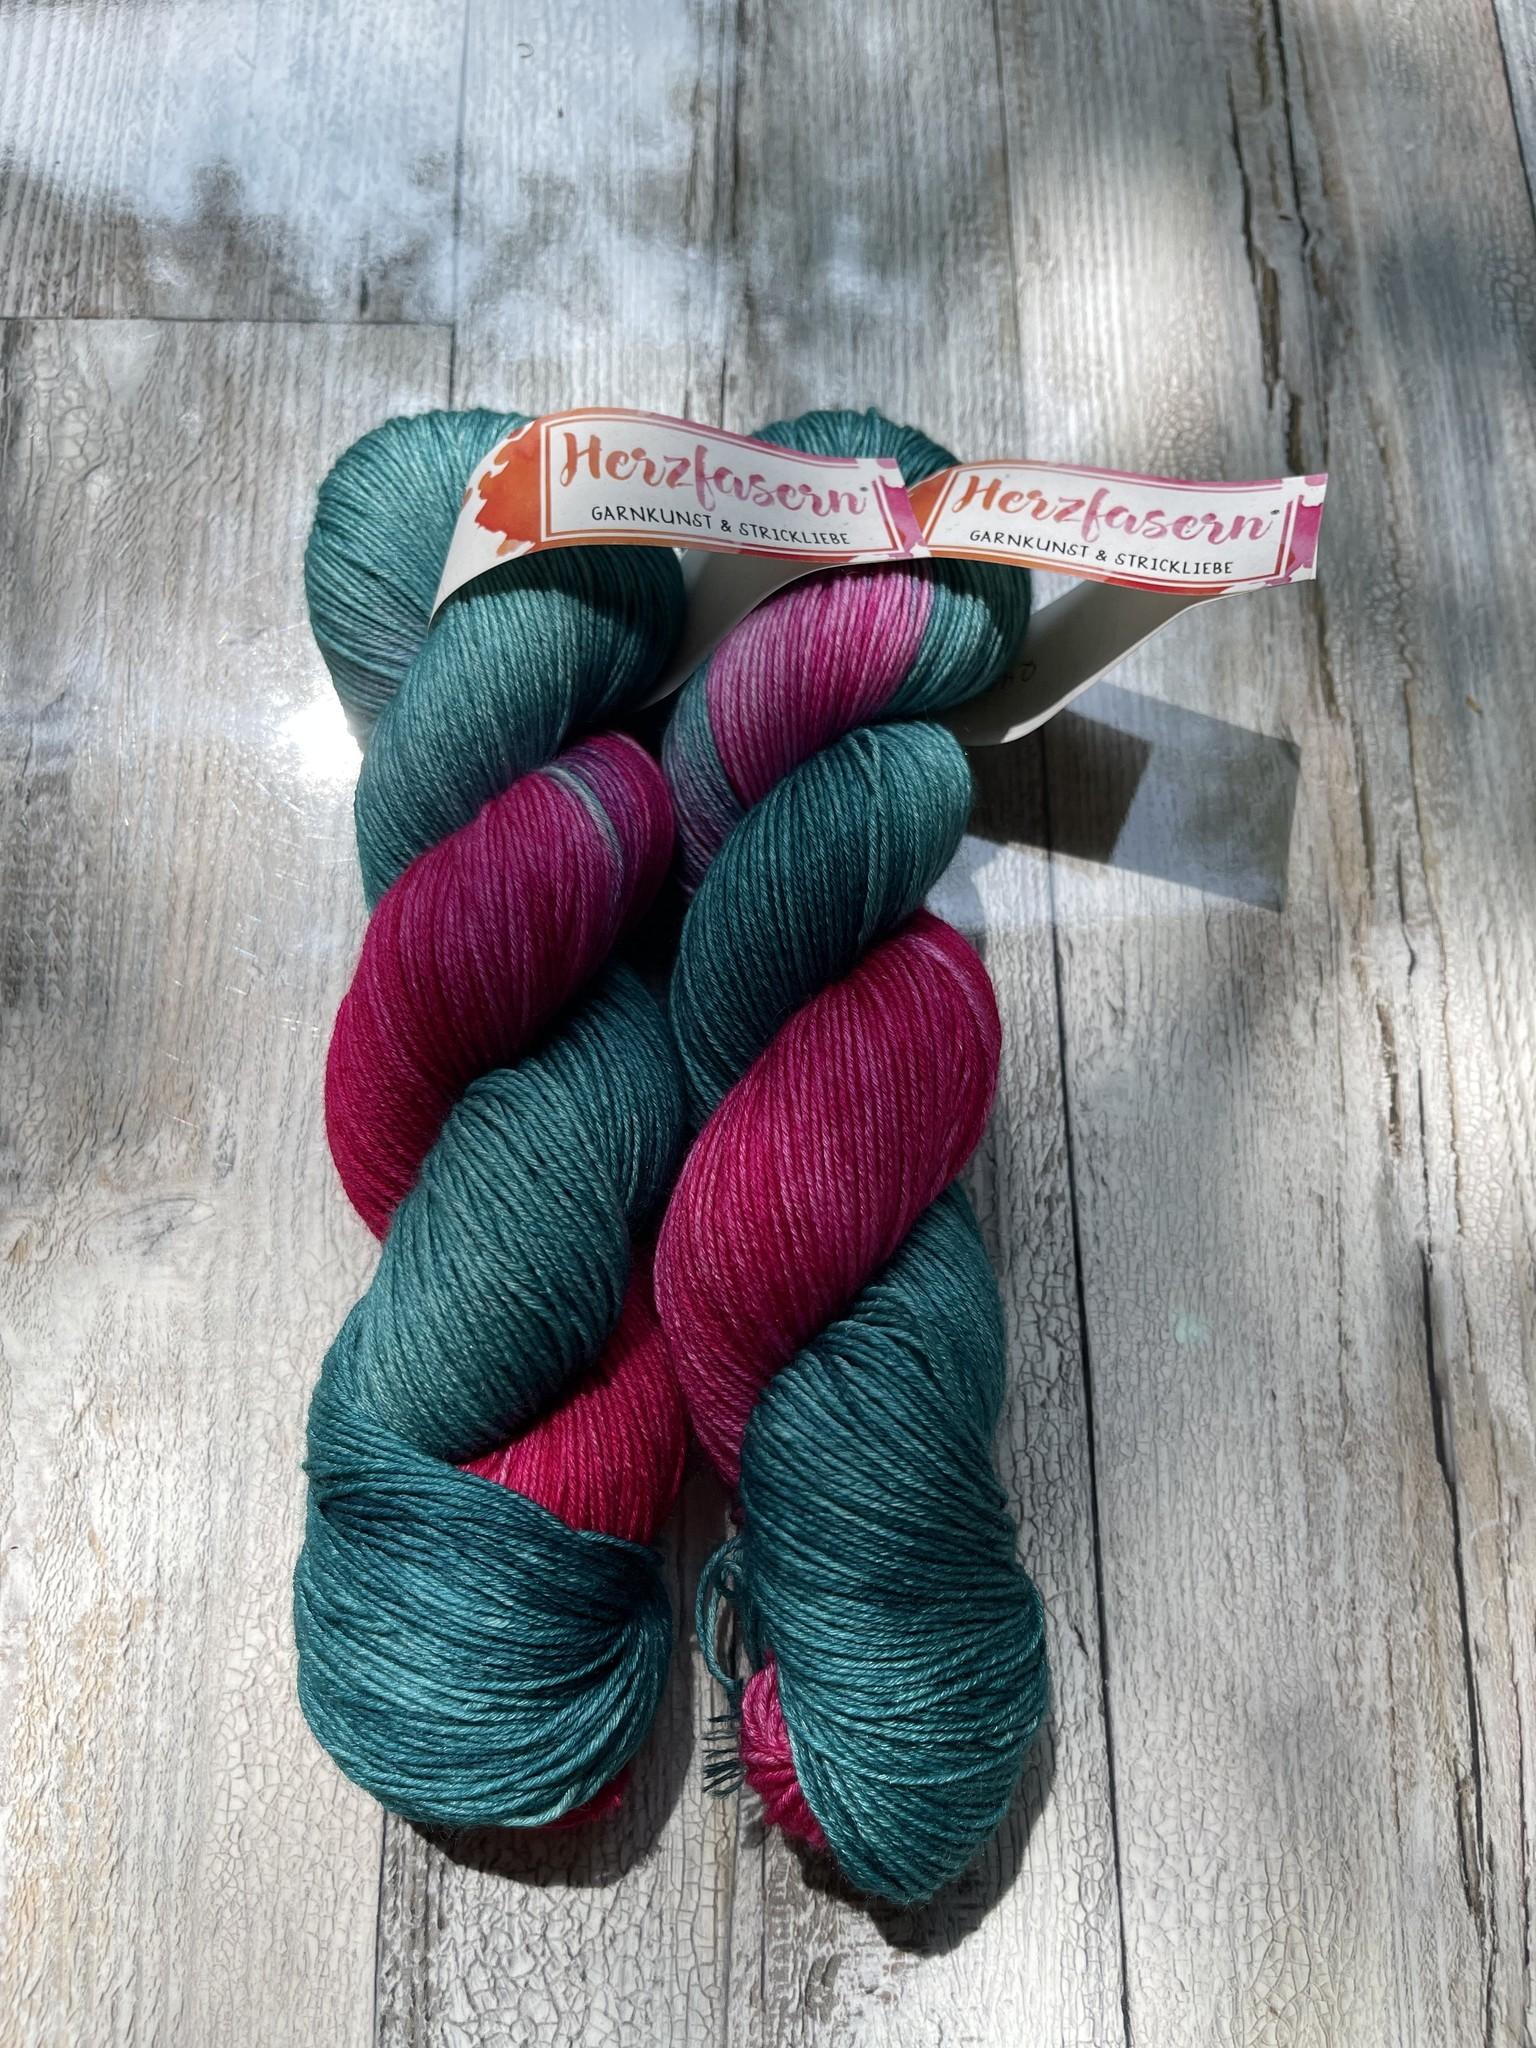 Herzfasern Merino/Seide - Flowers Smaragd